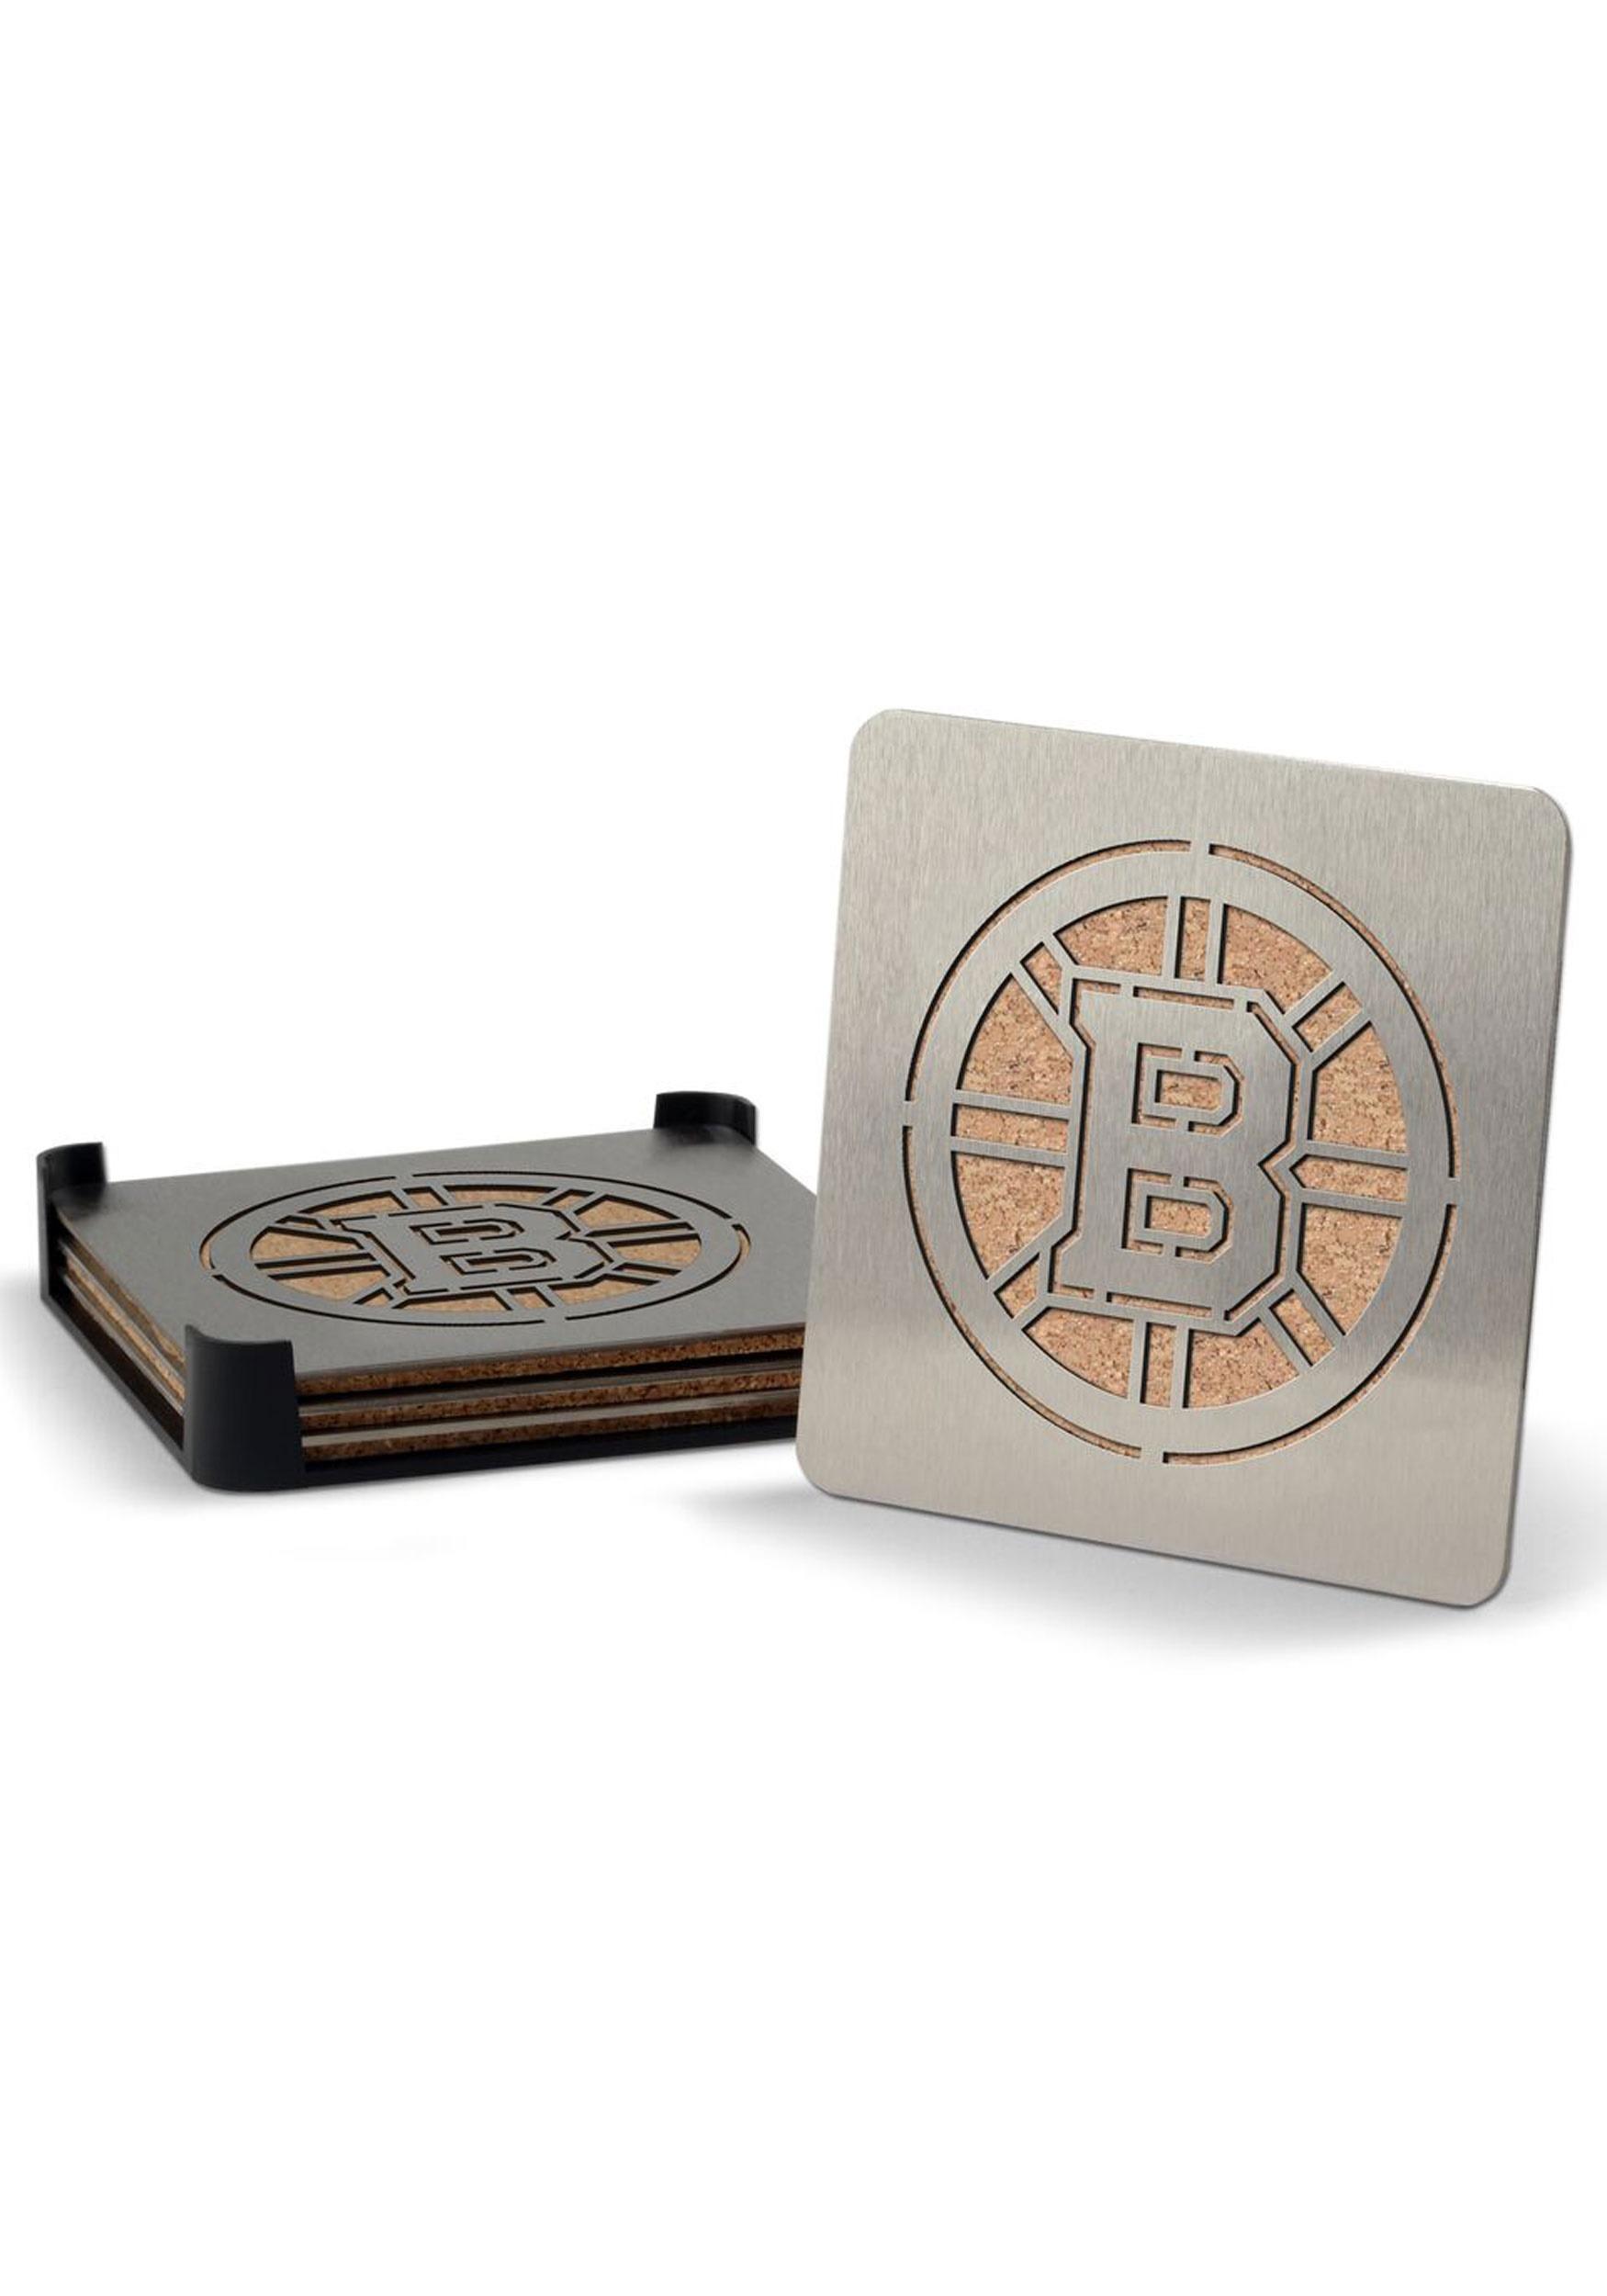 Boaster Coaster Boston Bruins Set